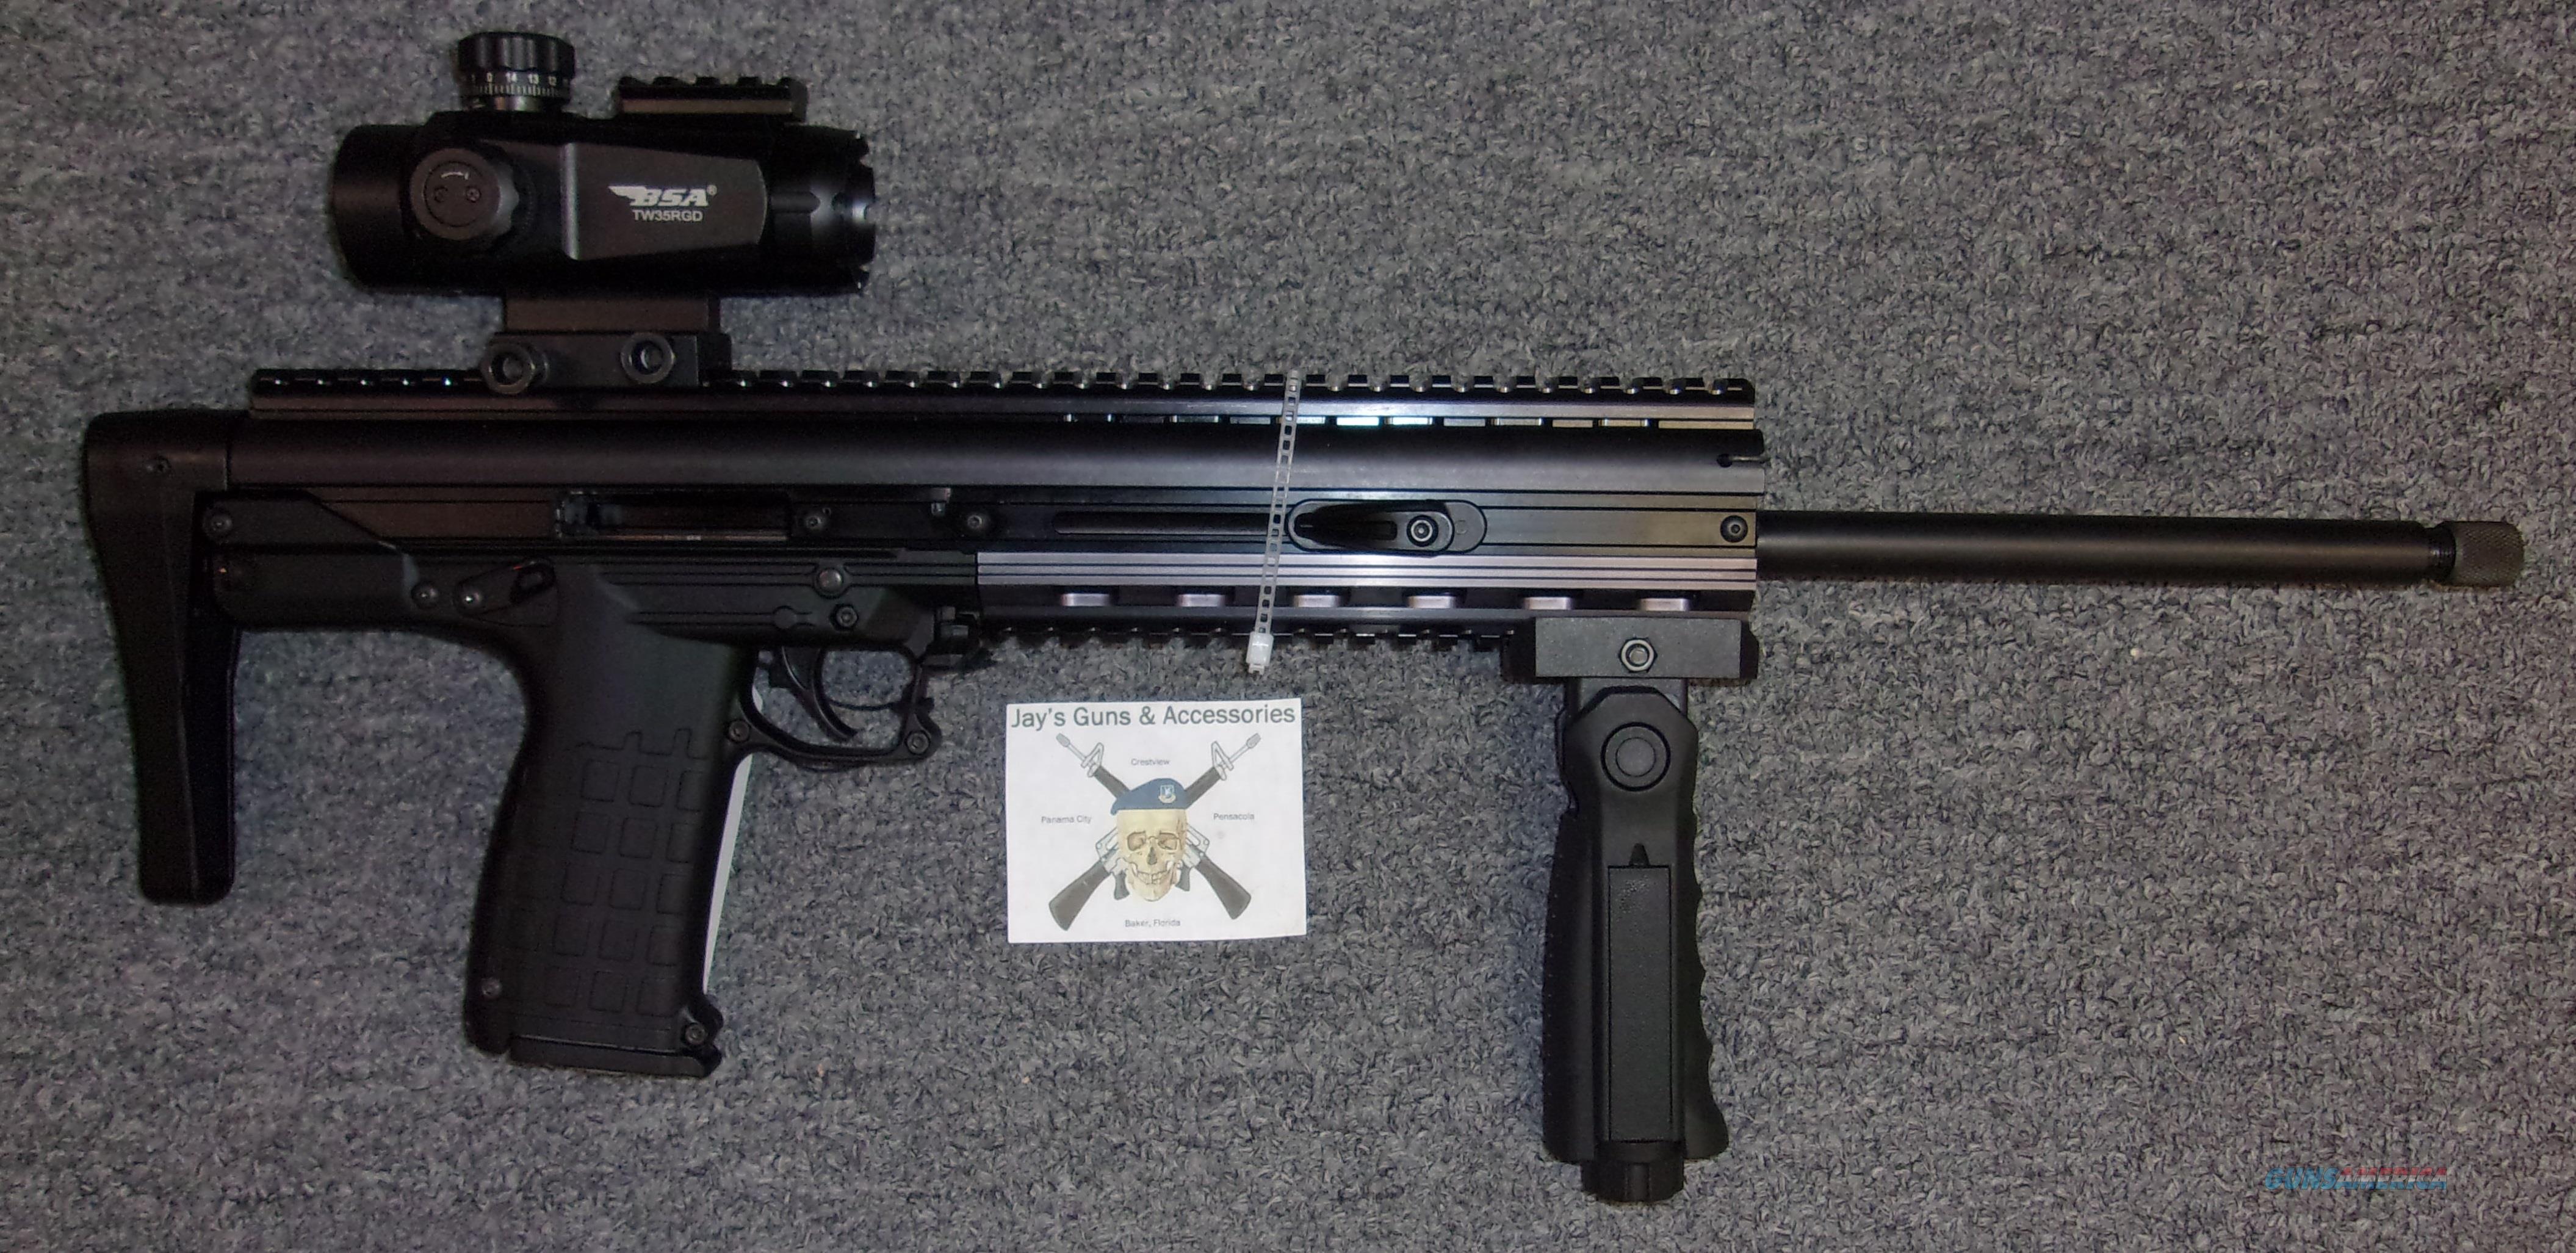 Kel-Tec CMR-30 w/Green/Red Dot  Guns > Rifles > Kel-Tec Rifles